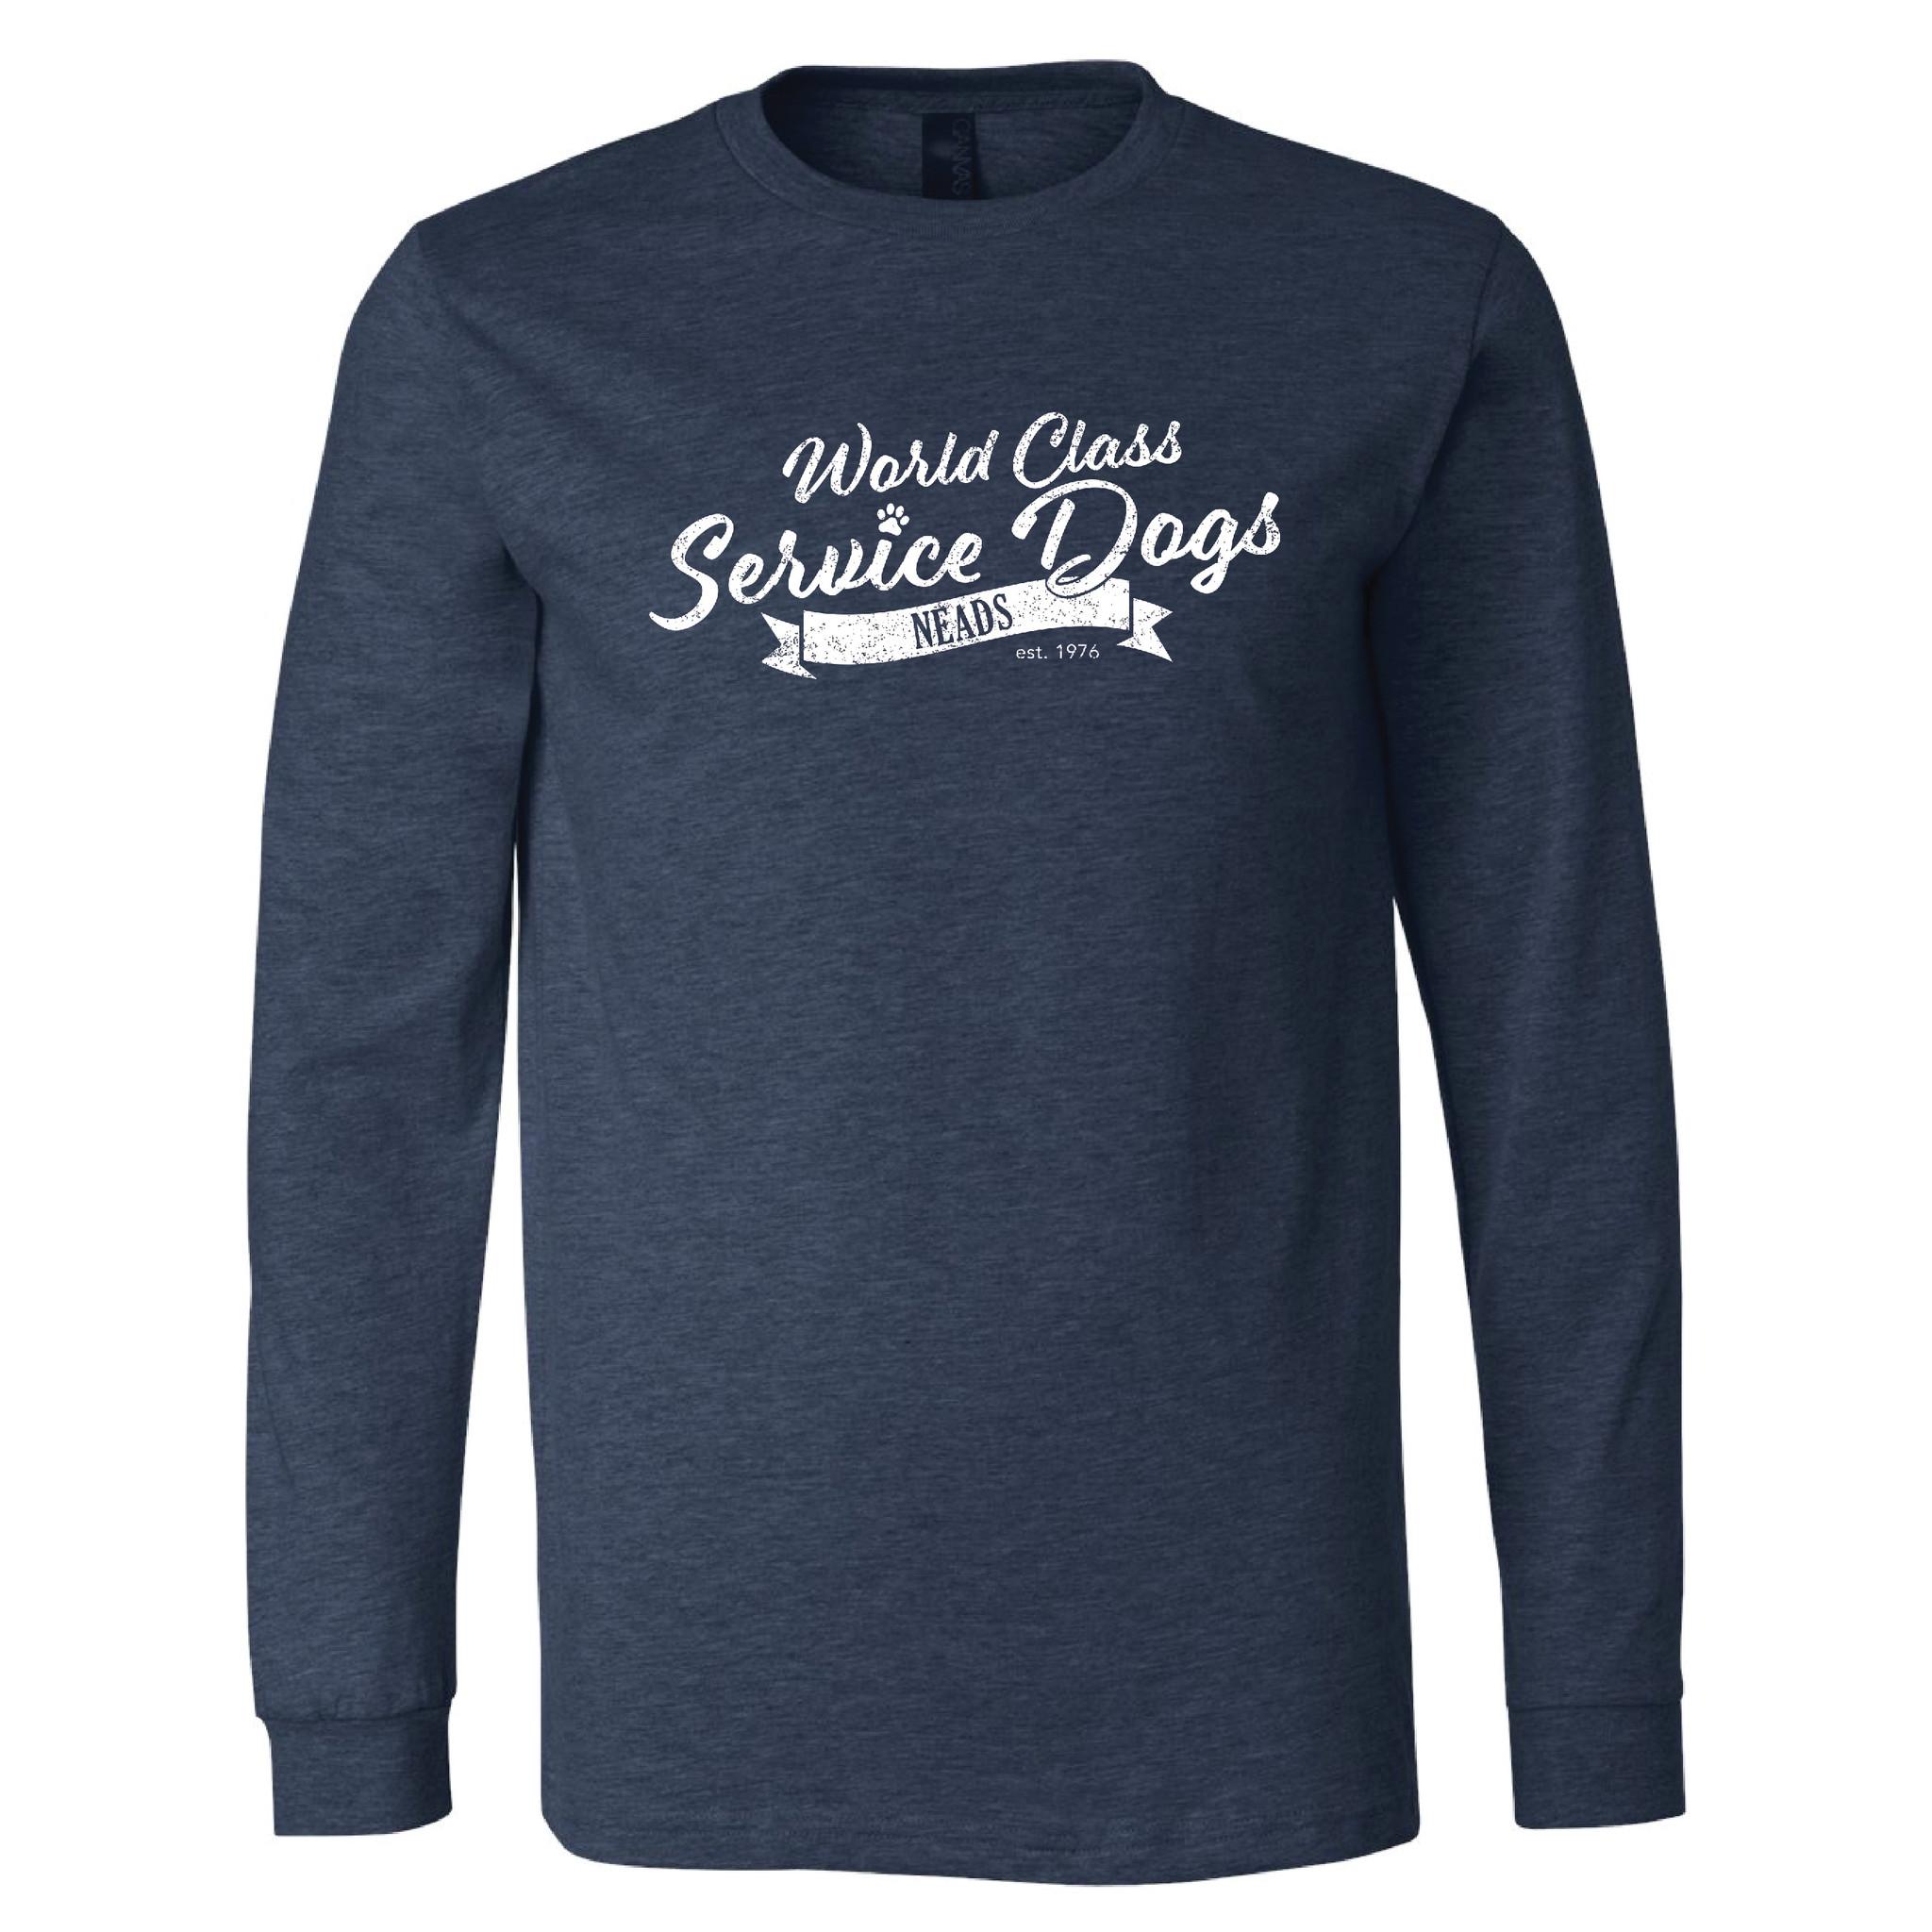 Unisex Long Sleeve T-Shirt